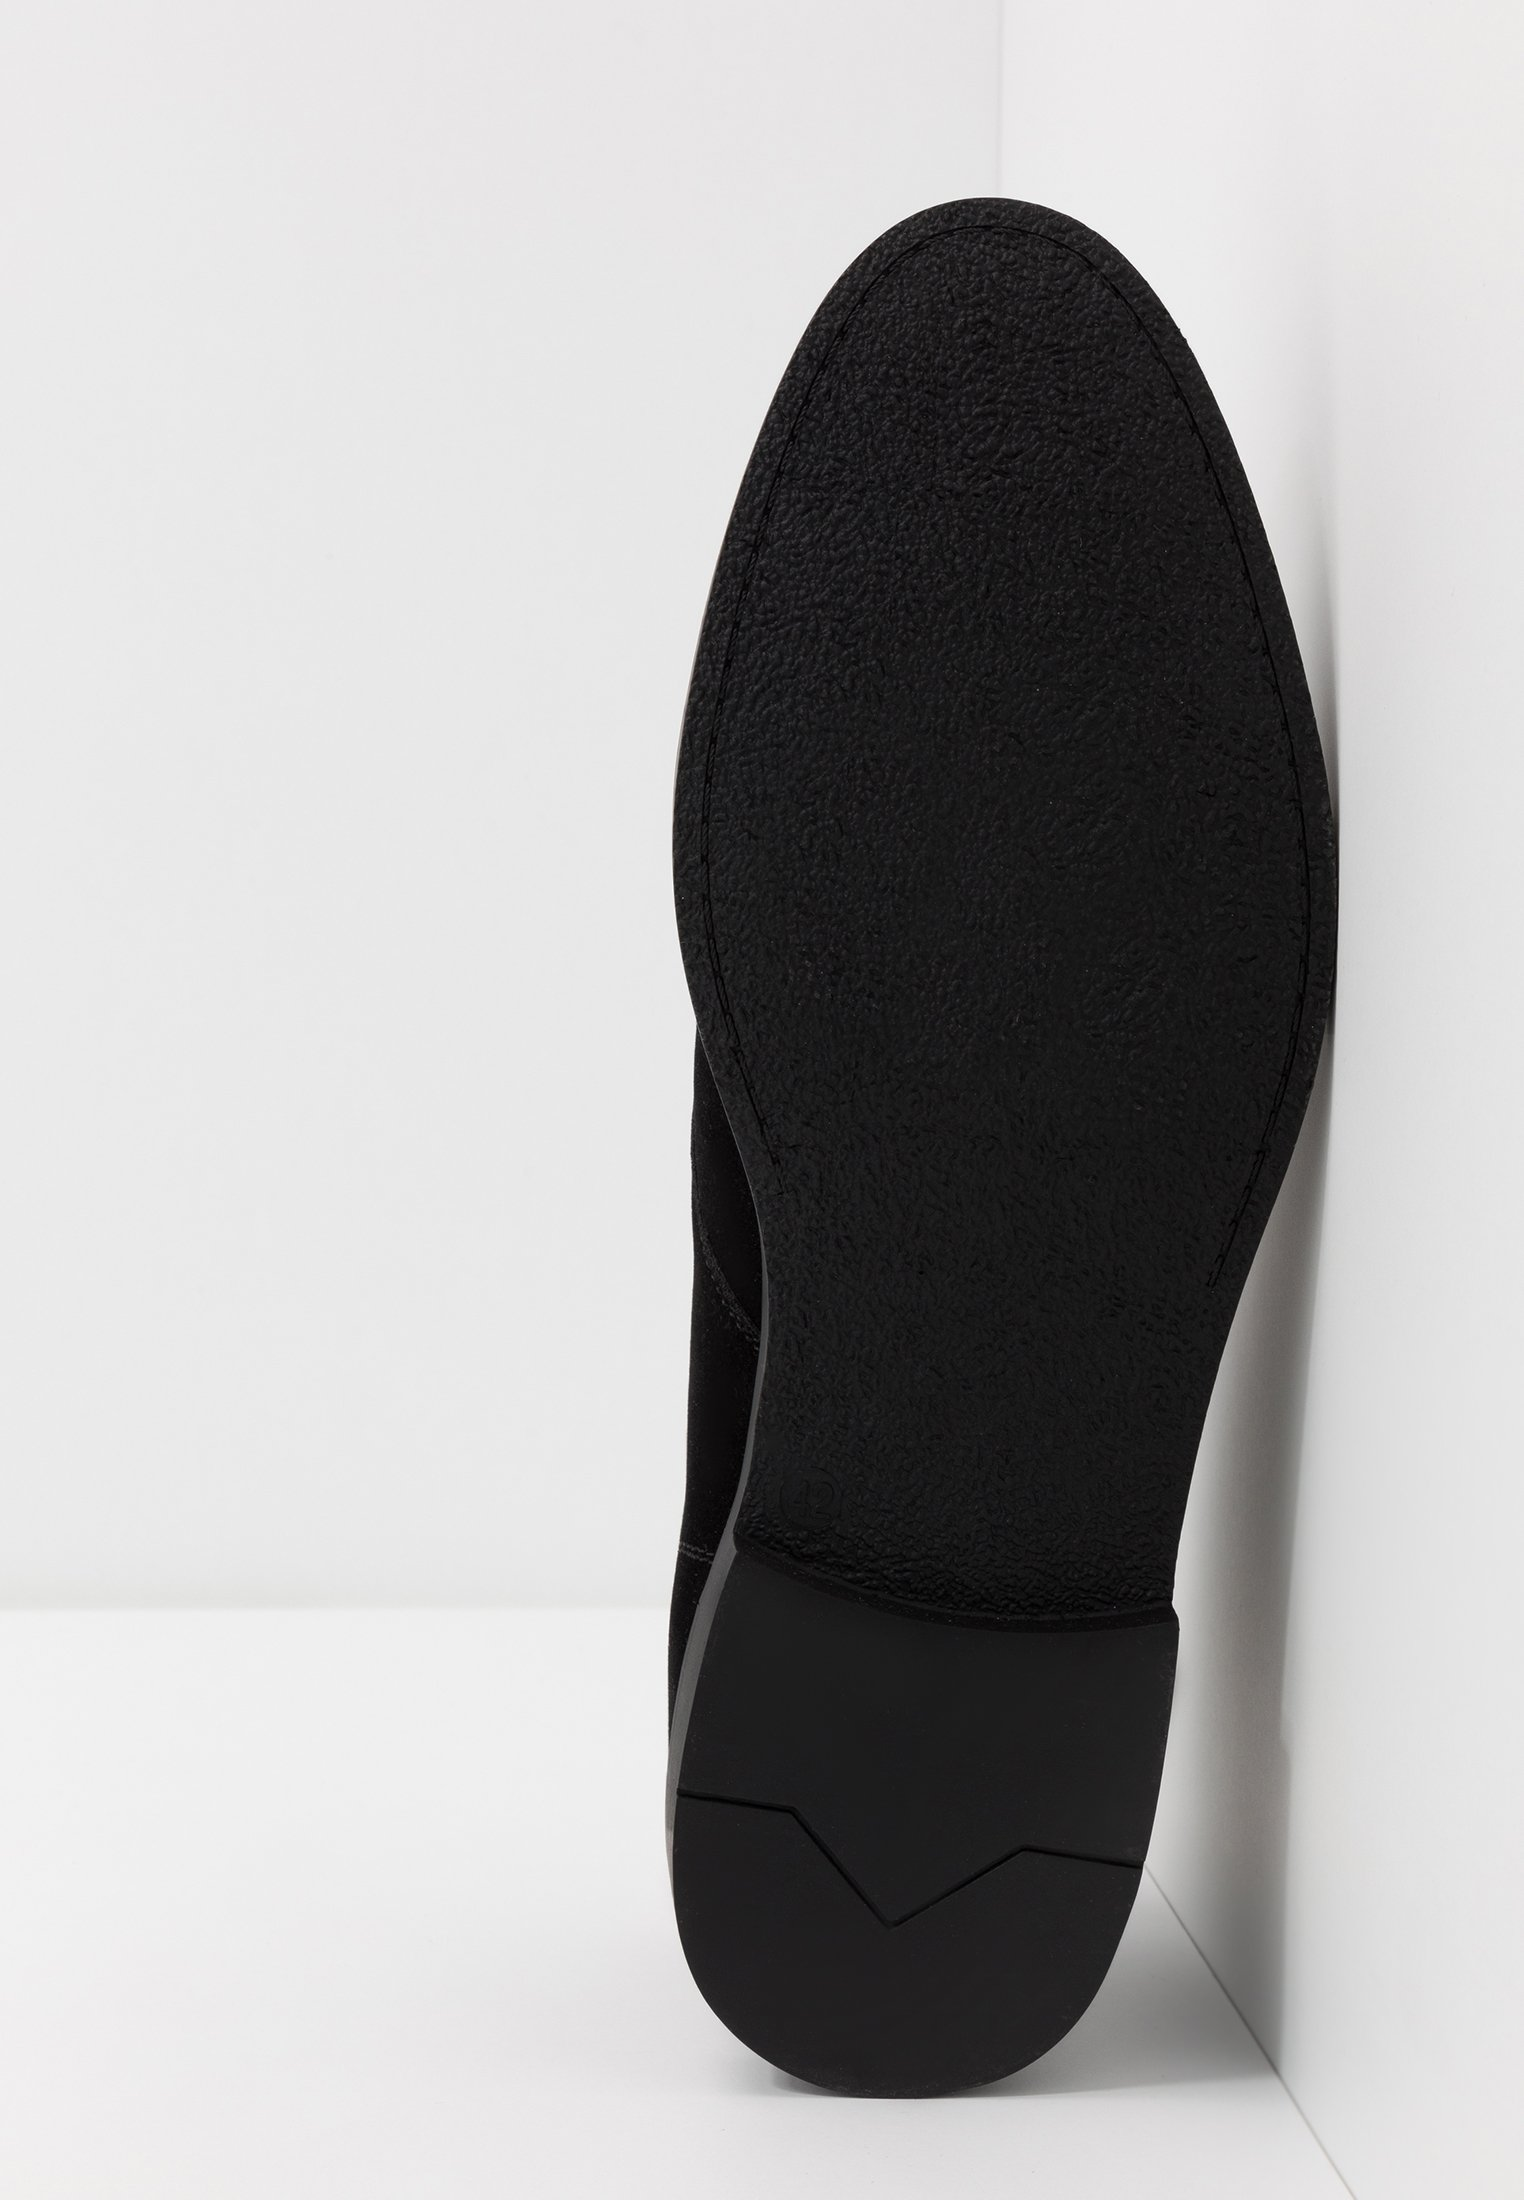 Pier One Oksfordki - black